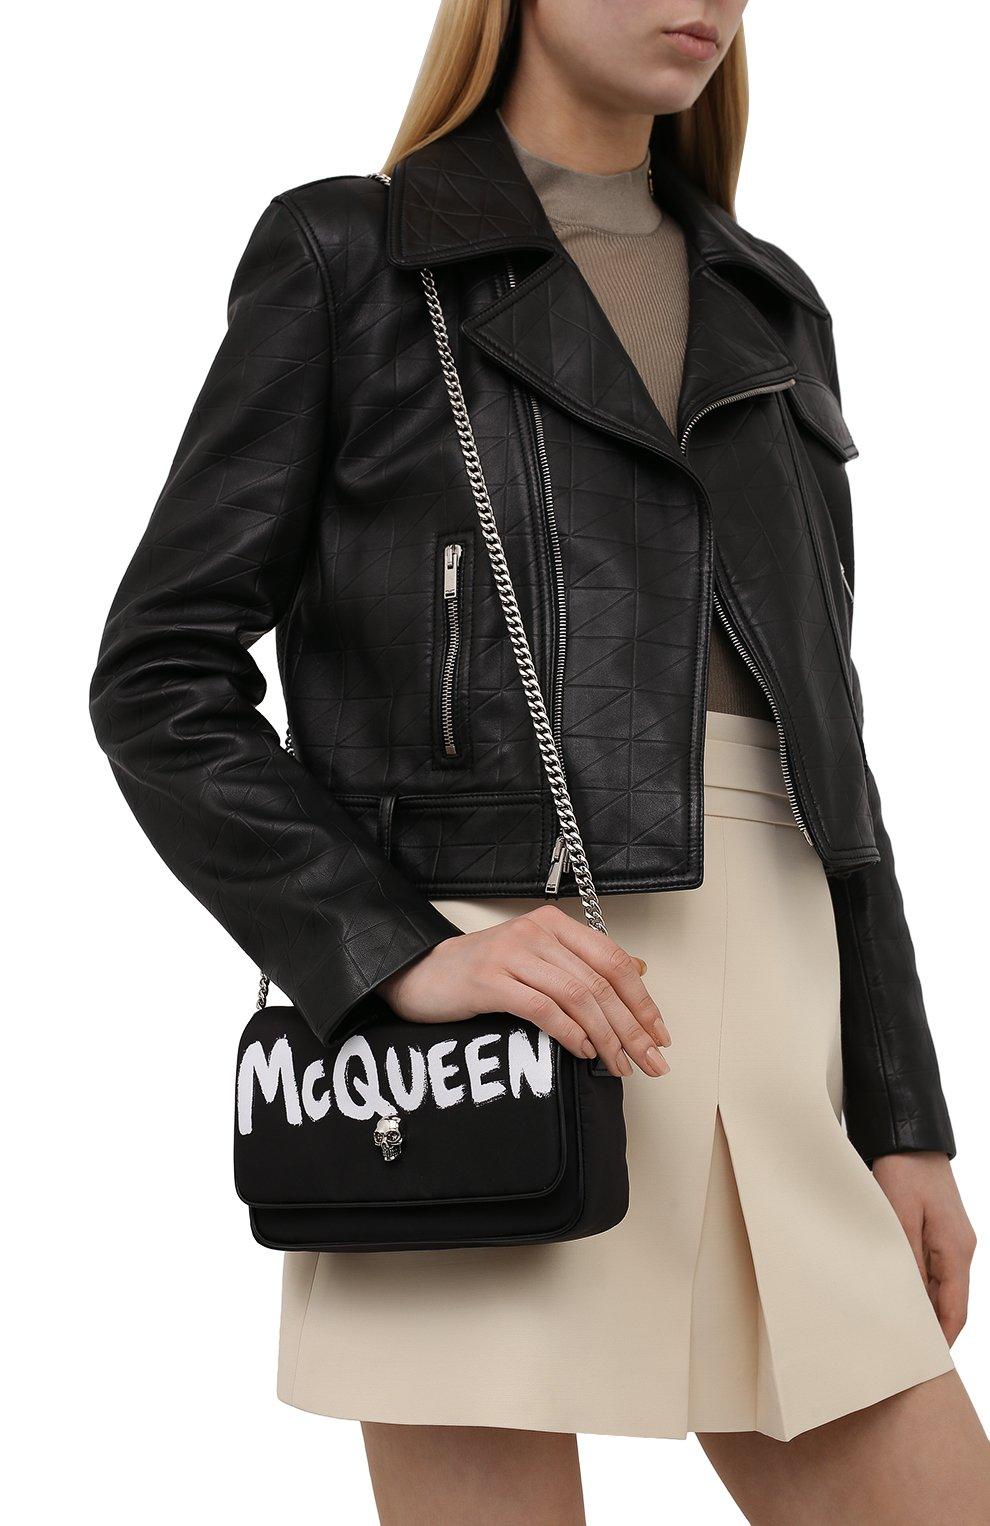 Женская сумка skull ALEXANDER MCQUEEN черного цвета, арт. 666120/16XAB | Фото 2 (Сумки-технические: Сумки через плечо; Размер: mini; Ремень/цепочка: На ремешке; Материал: Текстиль)